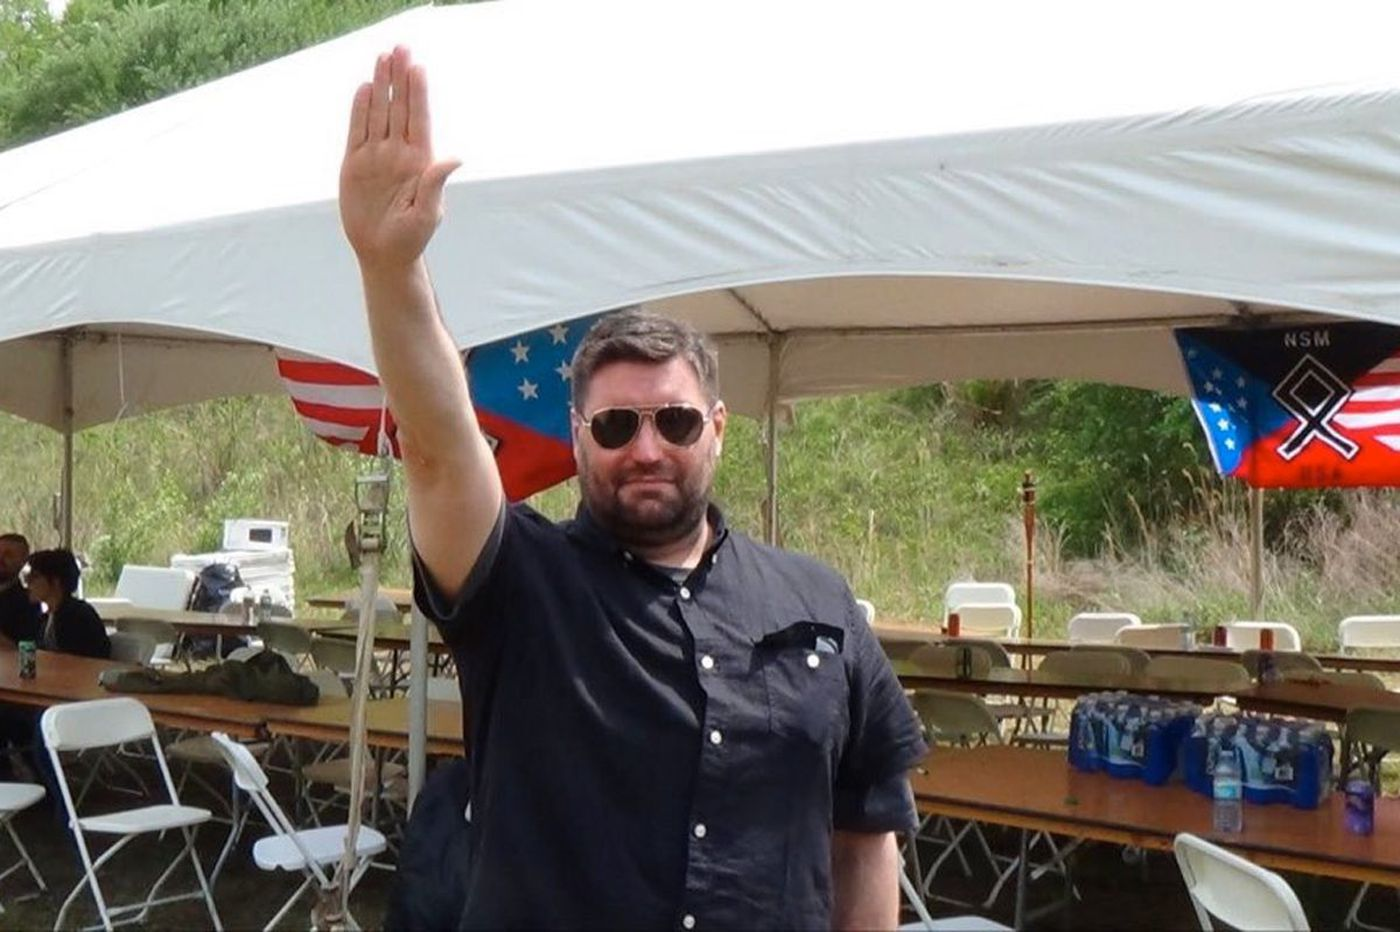 Top neo-Nazi shock jock grew up in the N.J. suburbs - and had a Jewish wife